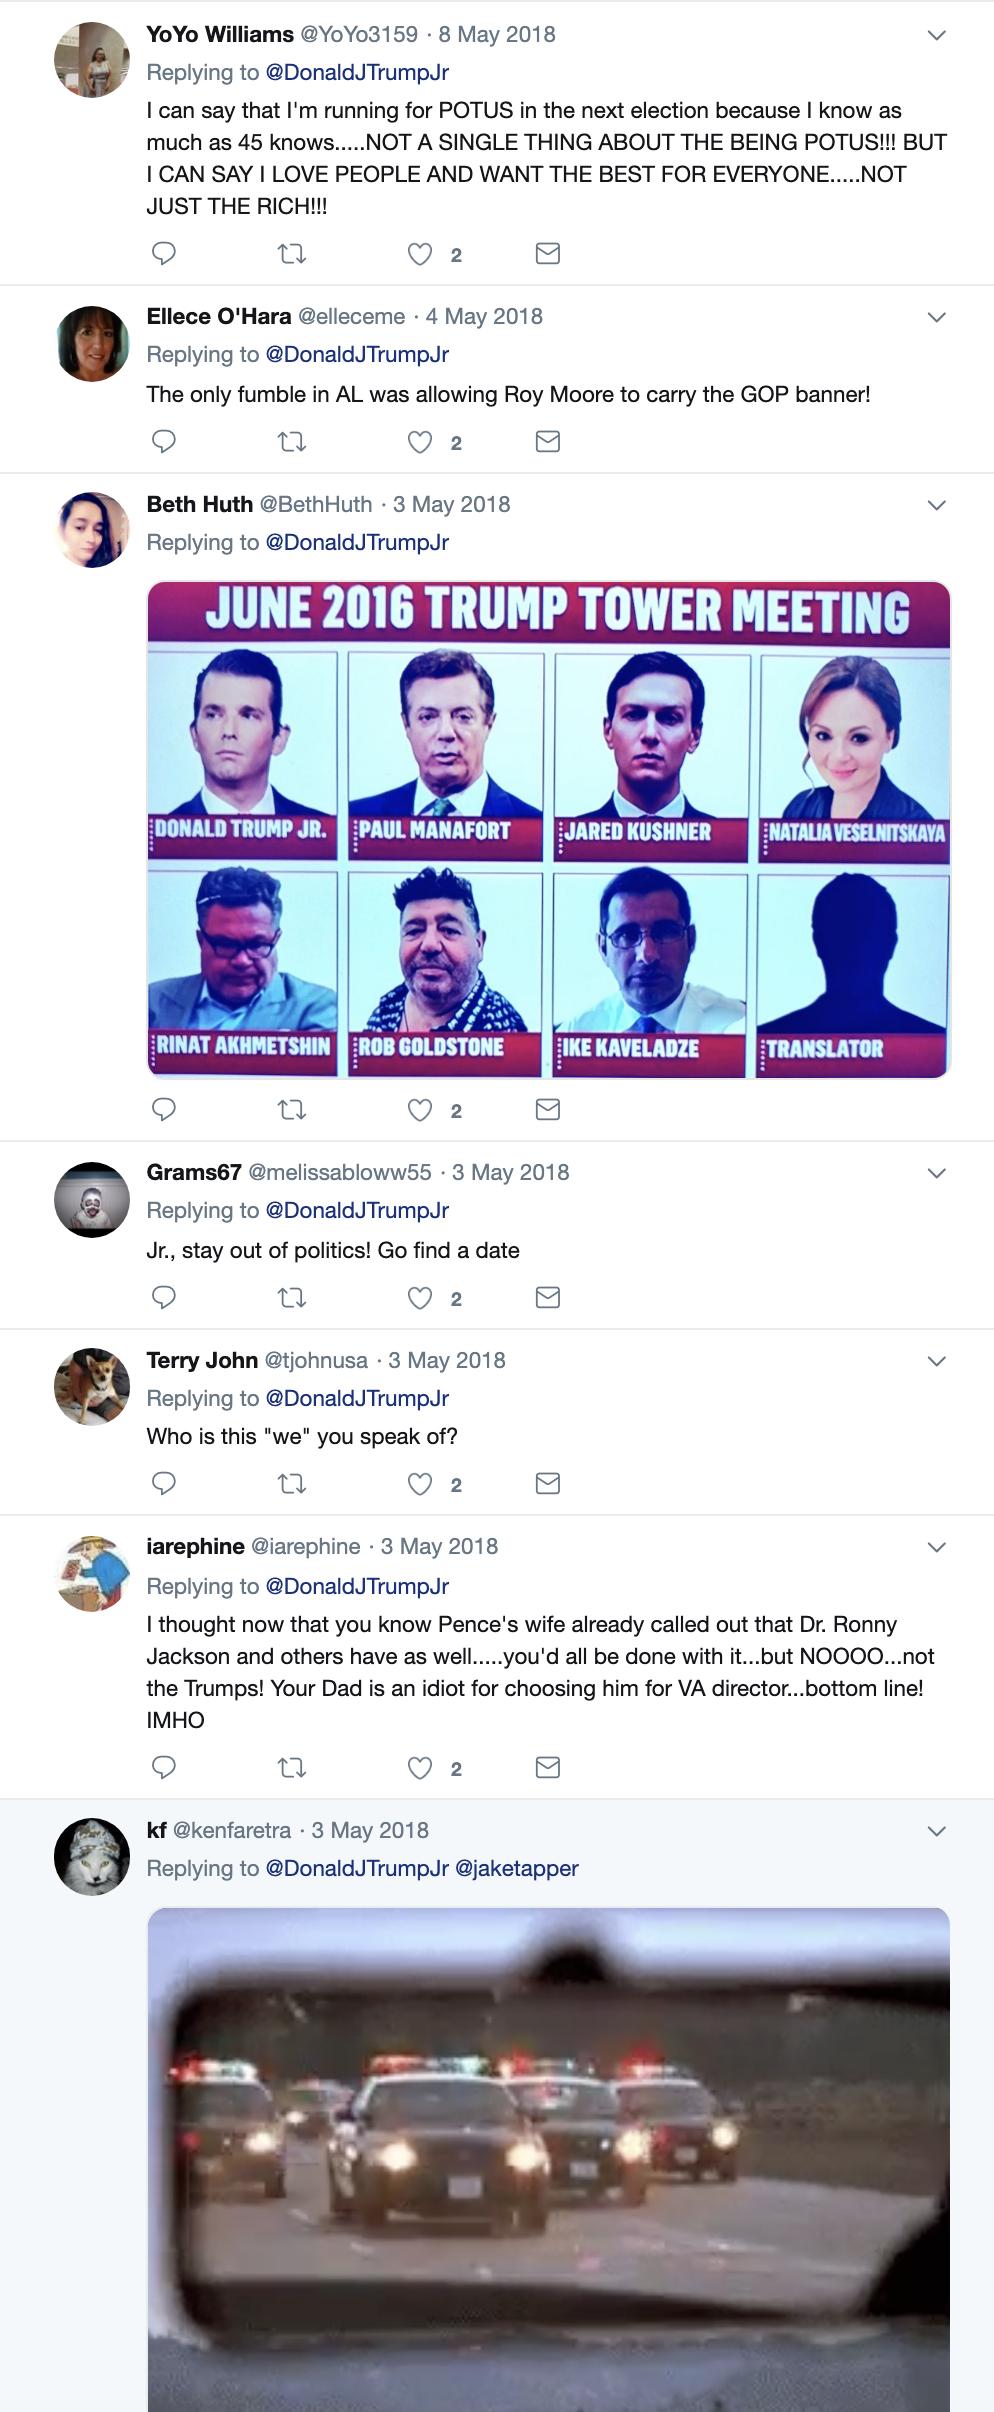 Screen-Shot-2019-05-02-at-4.00.18-PM Trump Jr. In Trouble After Major Lawsuit For Defamation Announced Corruption Crime Donald Trump Media Politics Top Stories